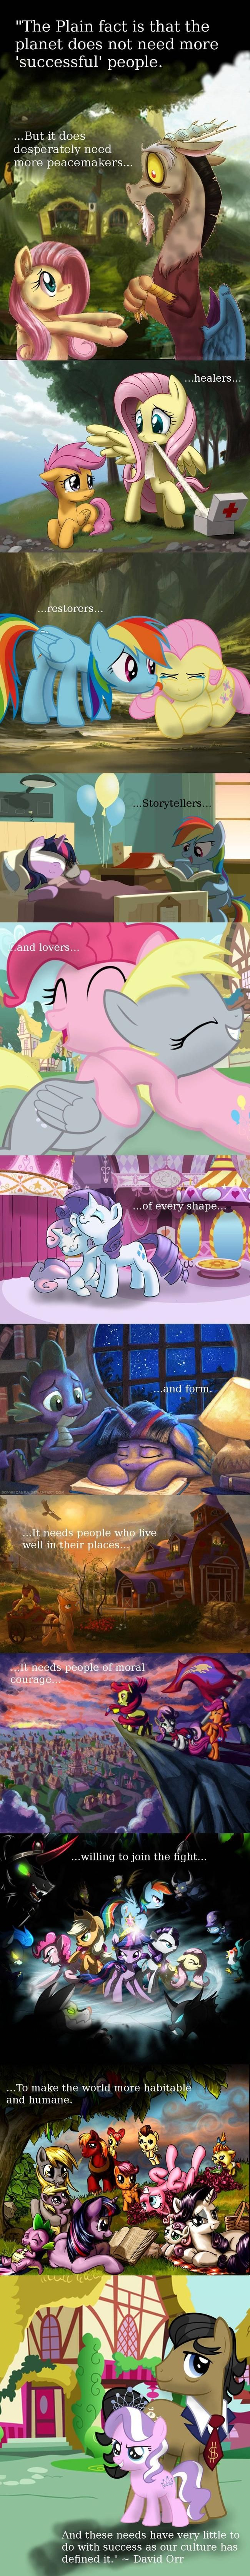 Inspiring quote told in My Little Pony fanart - via reddit